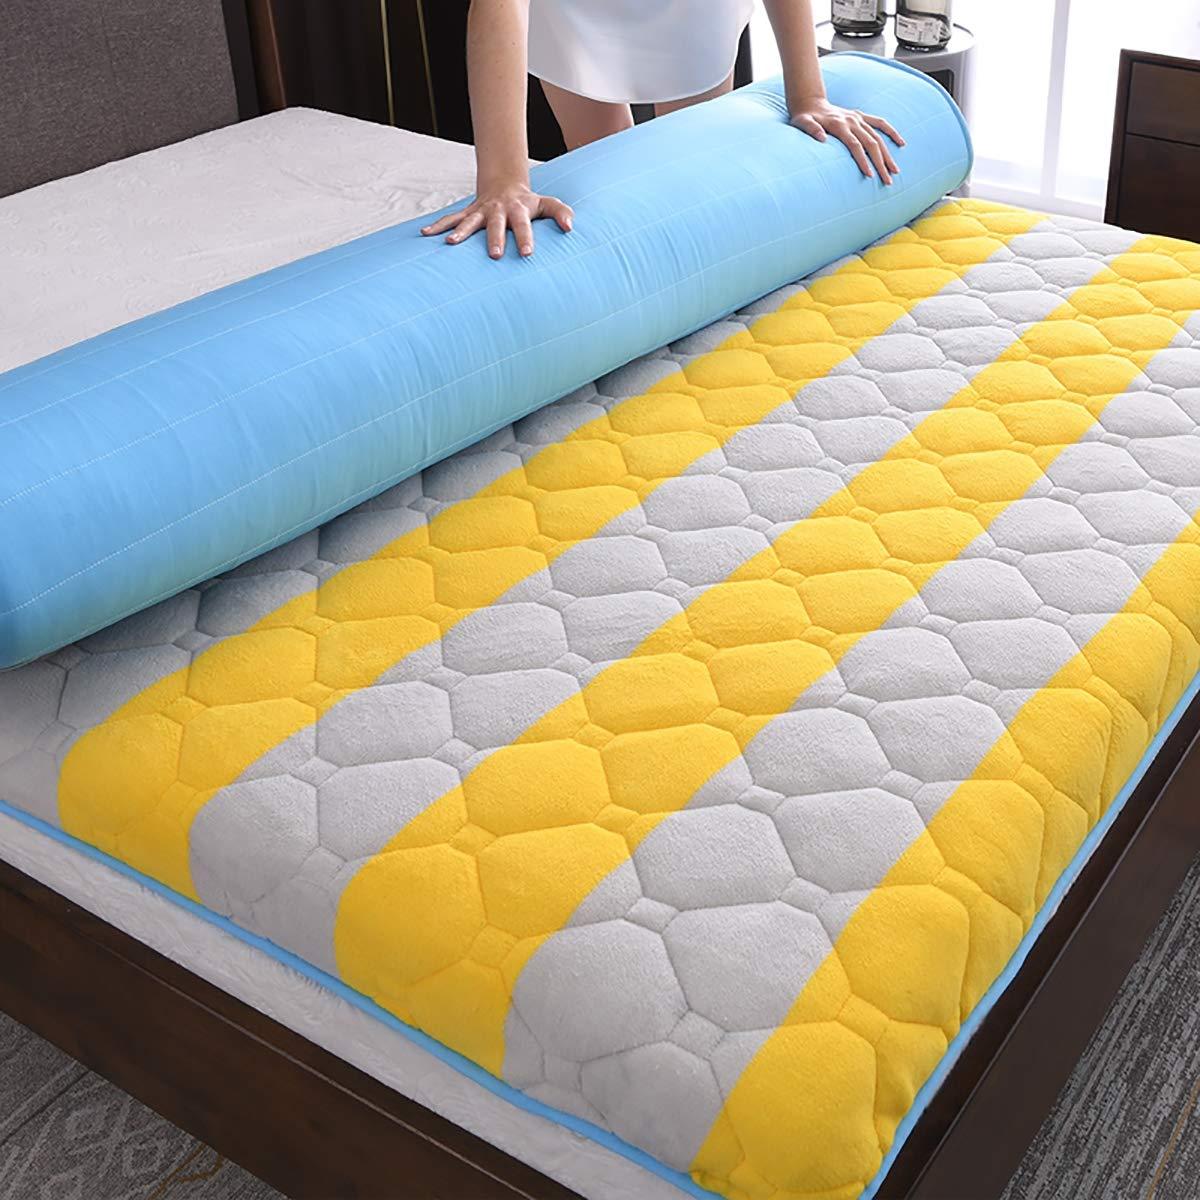 A 180200cm 10cm Thick Flannel Floor Futon Mattress, Japanese Traditional Futon Mattress Classe Sleeping Tatami Floor mat Mattress Topper for Dorm Bedroom,B,90  200cm